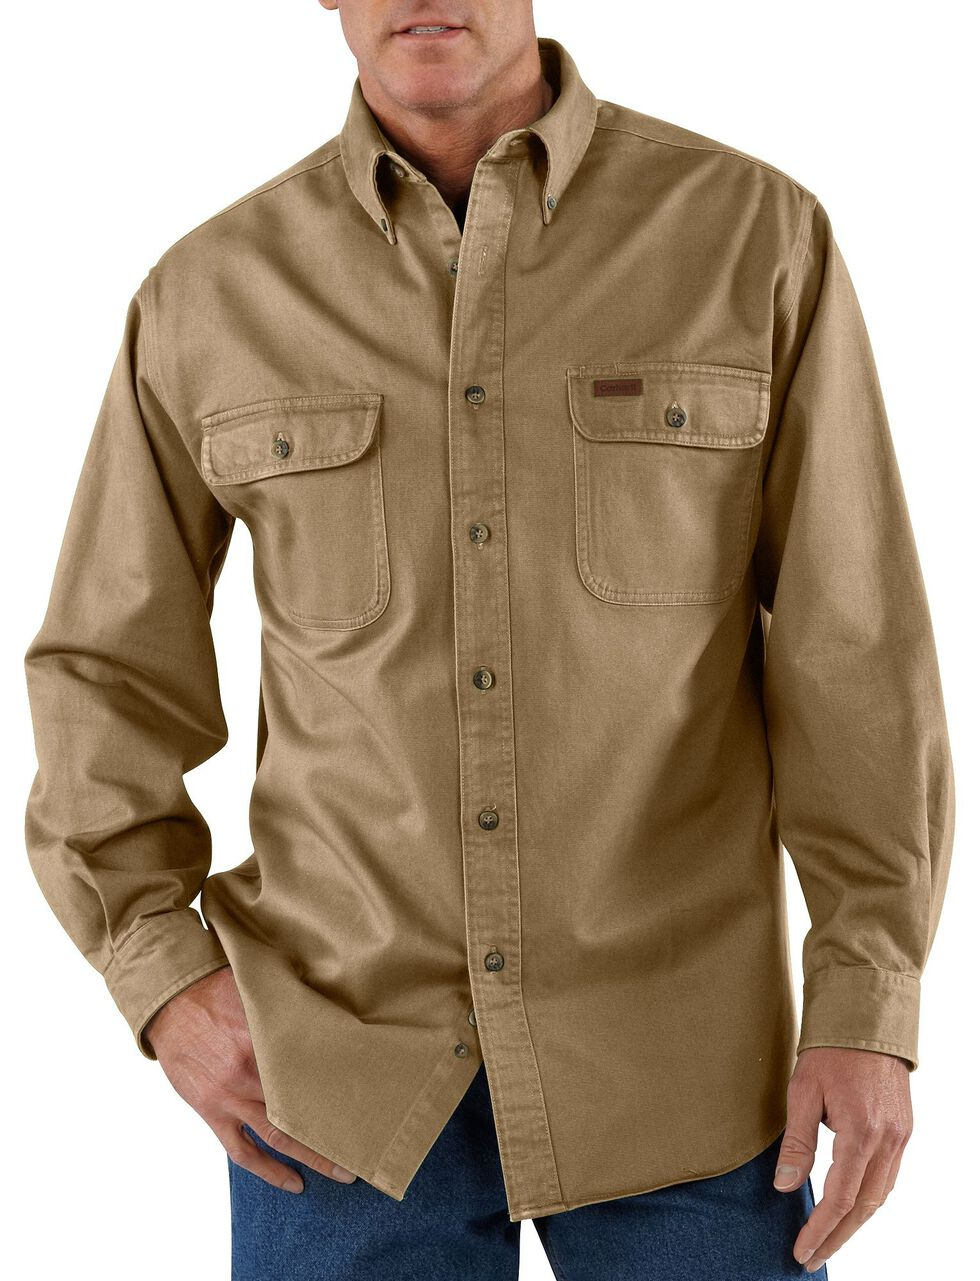 Carhartt Sandstone Twill Work Shirt, Stone, hi-res